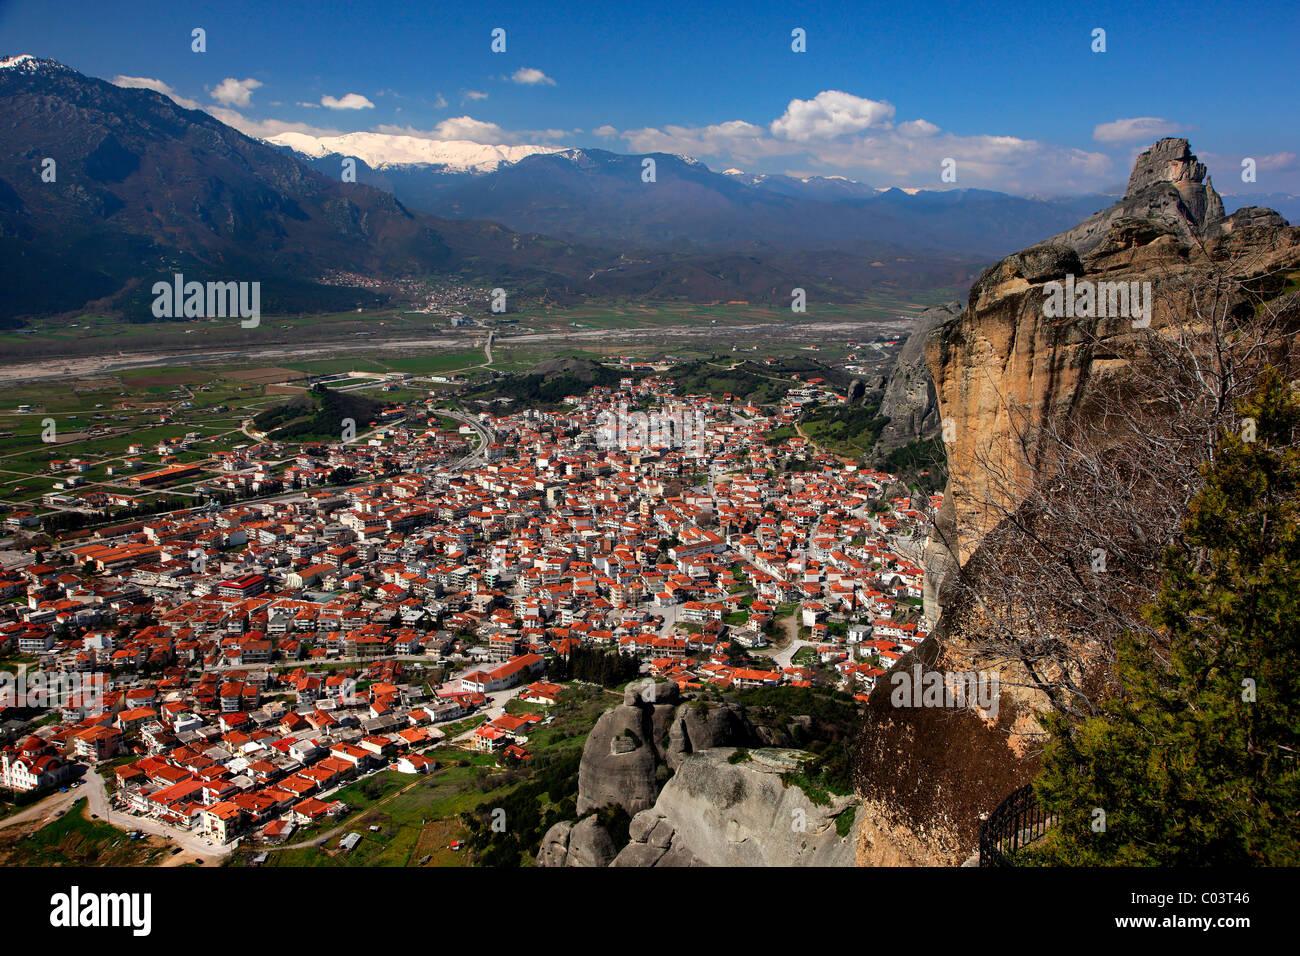 Kalambaka town in the 'shadow' of the Meteora rocks. Trikala, Thessaly, Greece - Stock Image